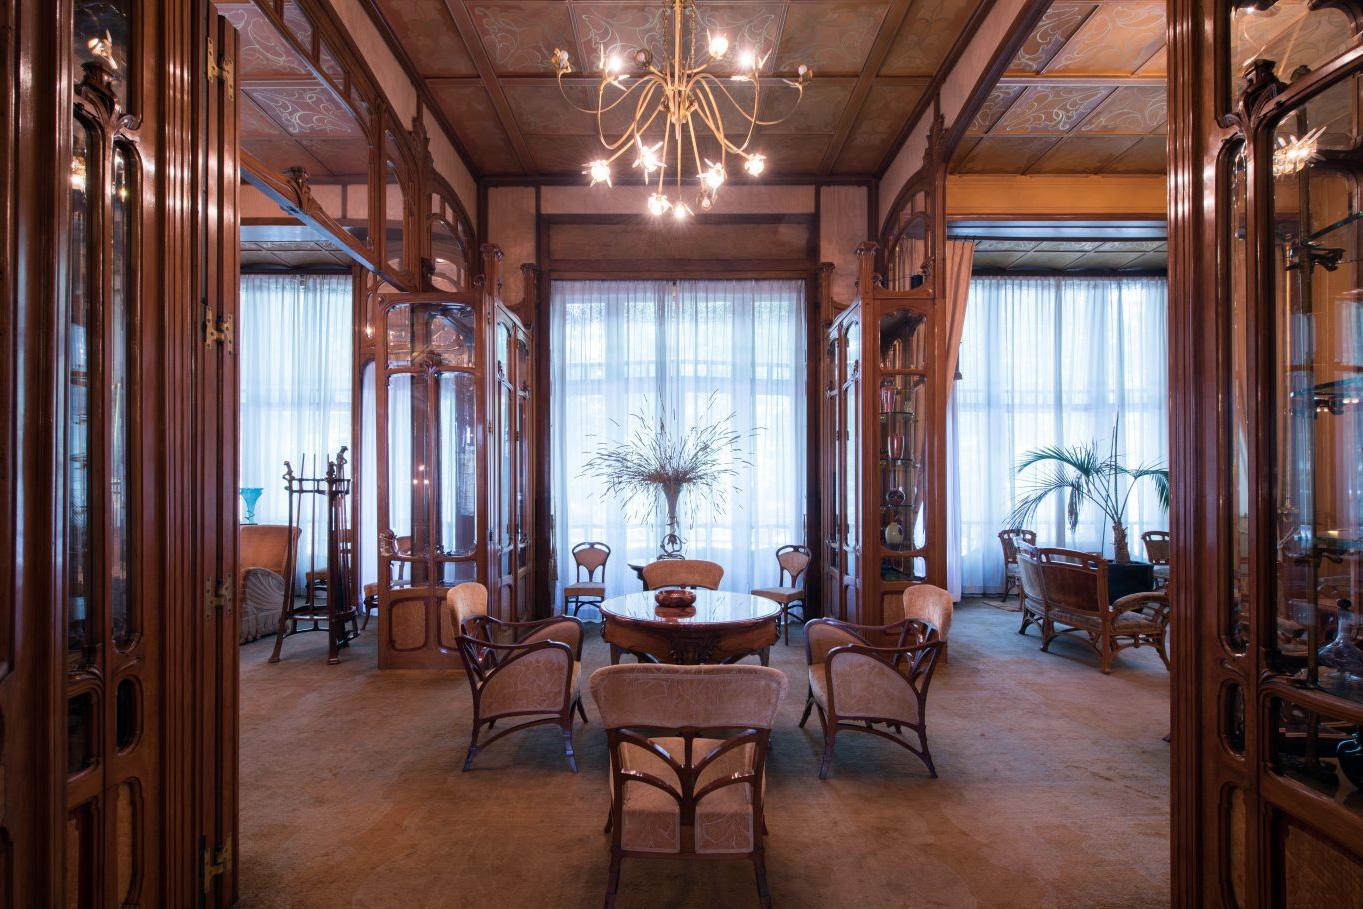 Hôtel Solvay